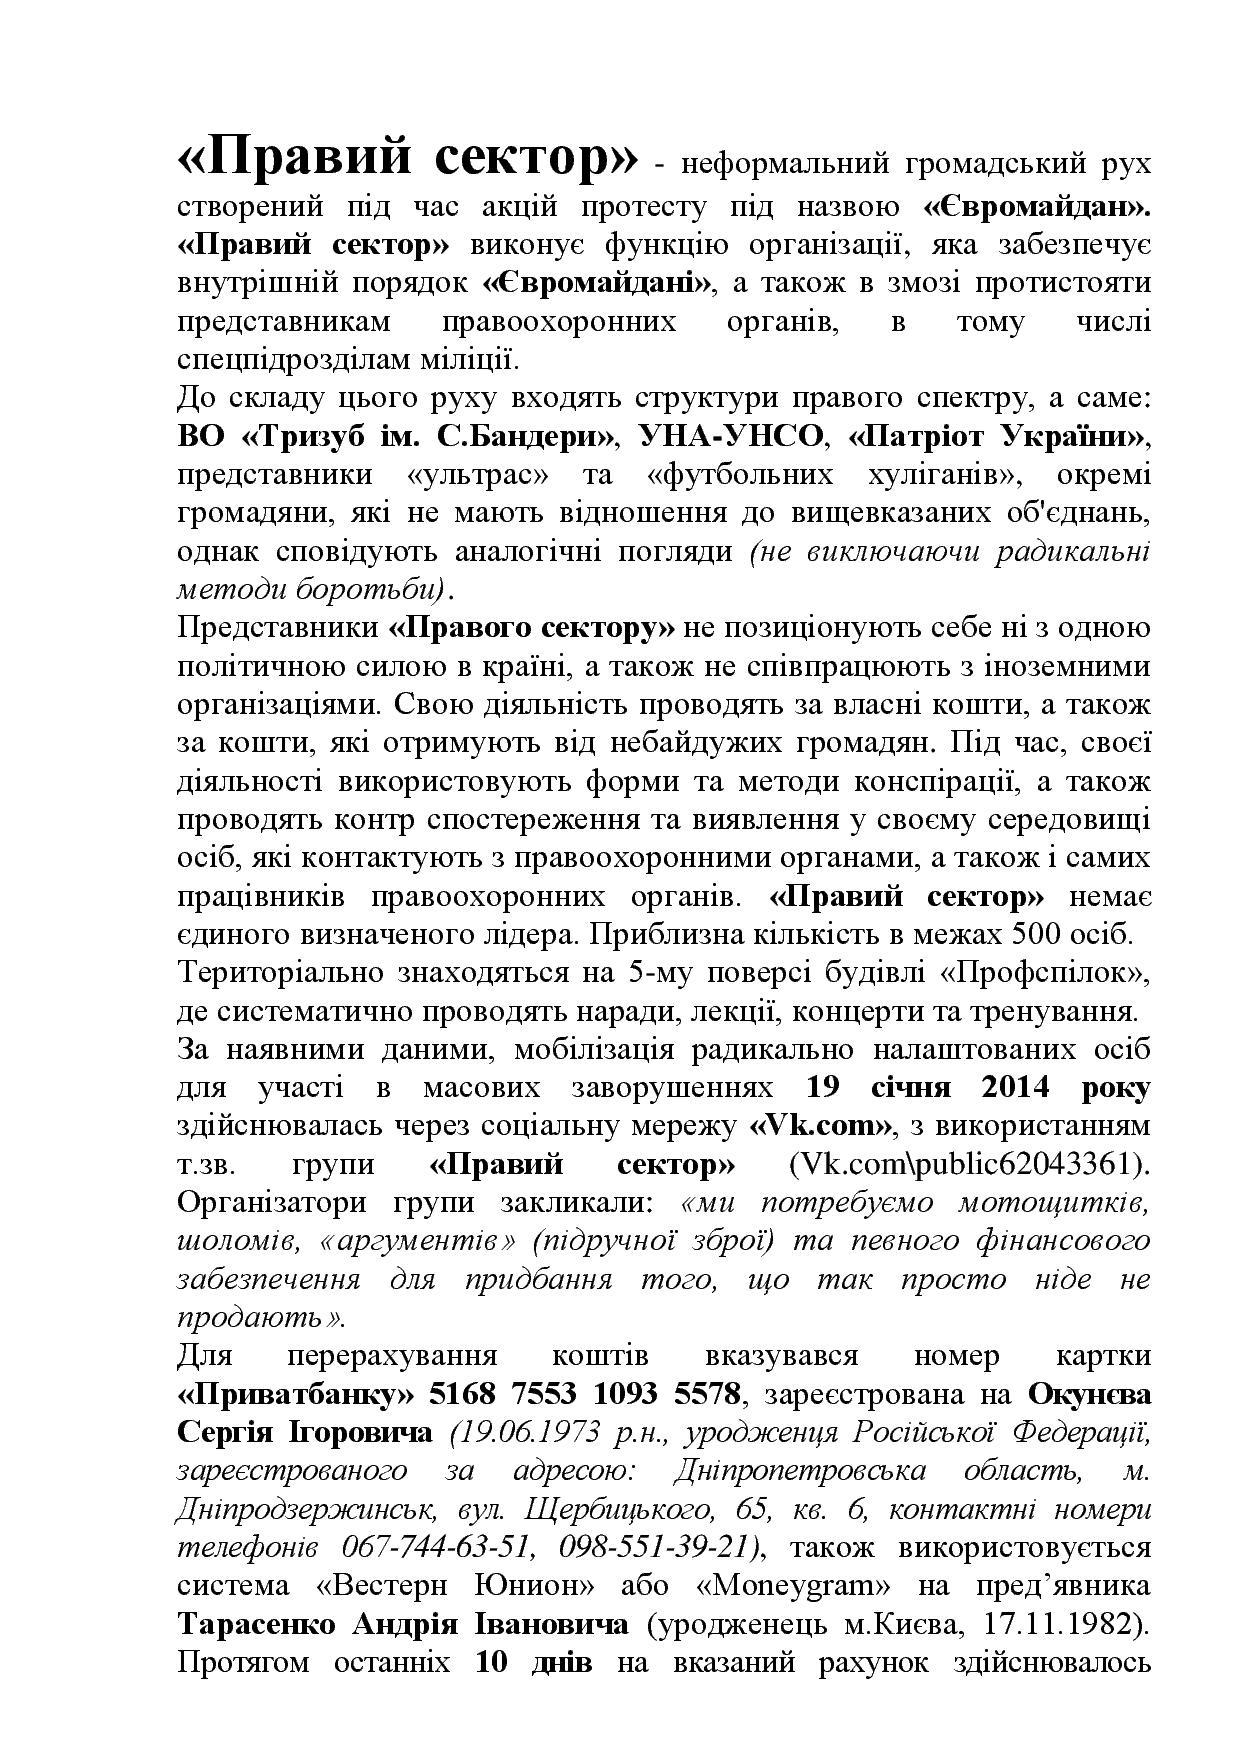 Списки Правого сектора